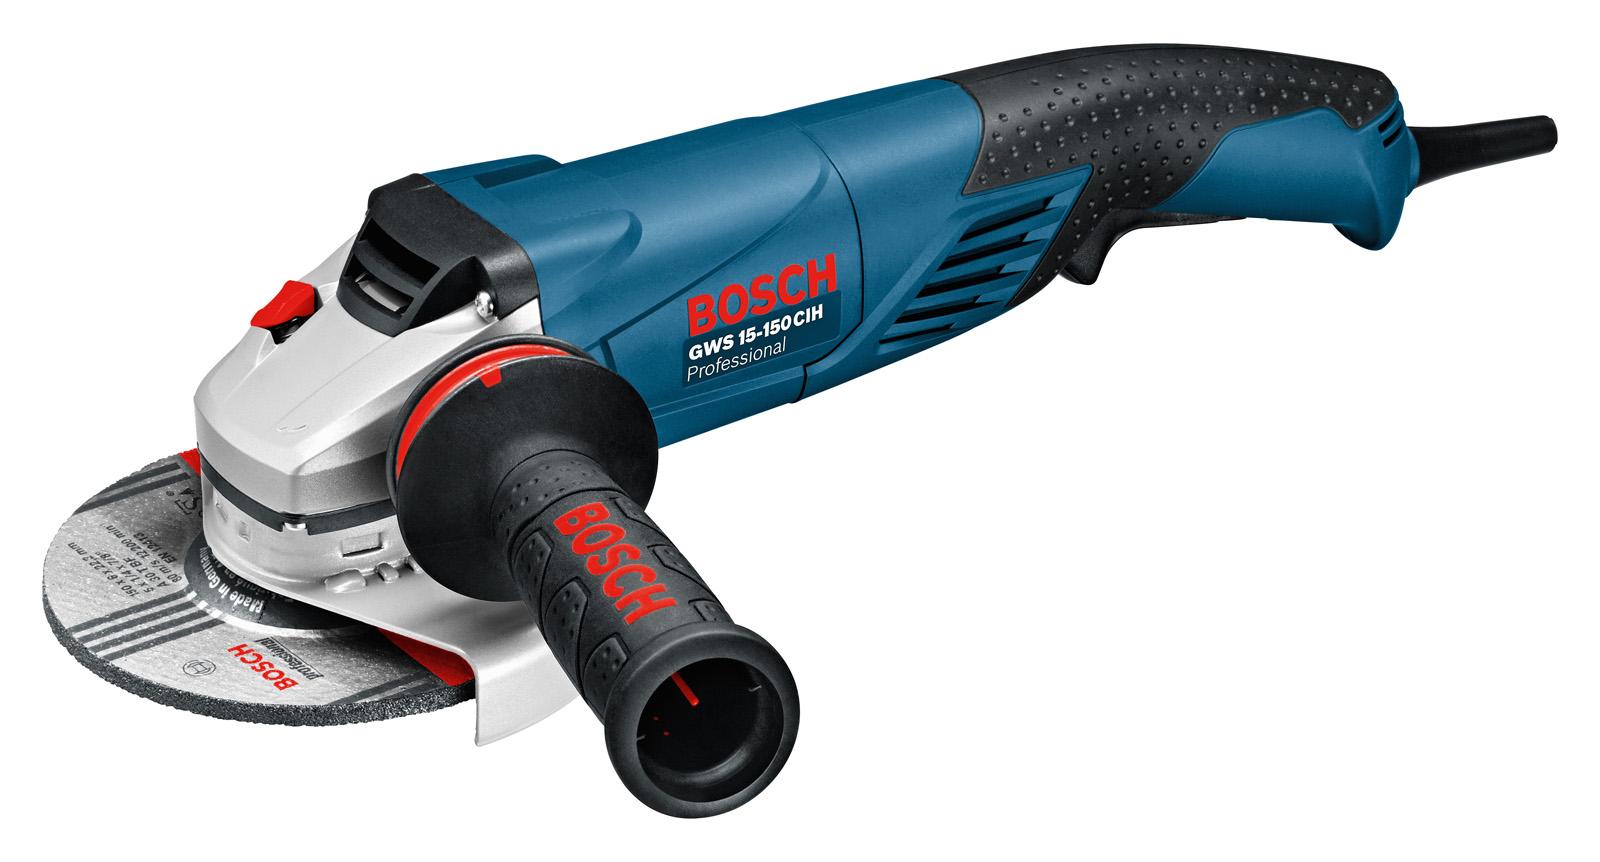 Ушм (болгарка) Bosch  9814.000